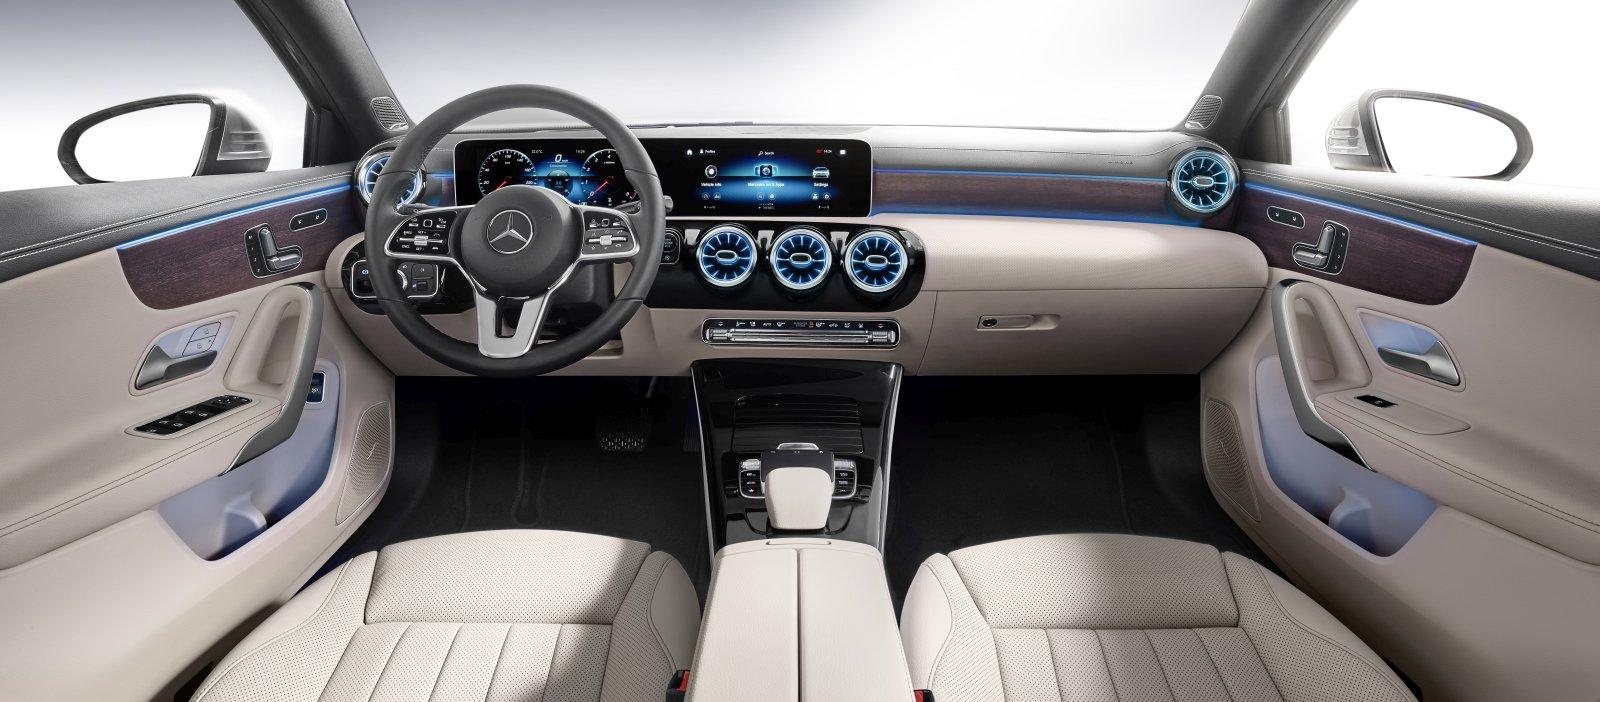 https://www.allesauto.at/wp-content/uploads/2018/07/Die-neue-Mercedes-Benz-A-Klasse-Limousine-Interieur.jpg